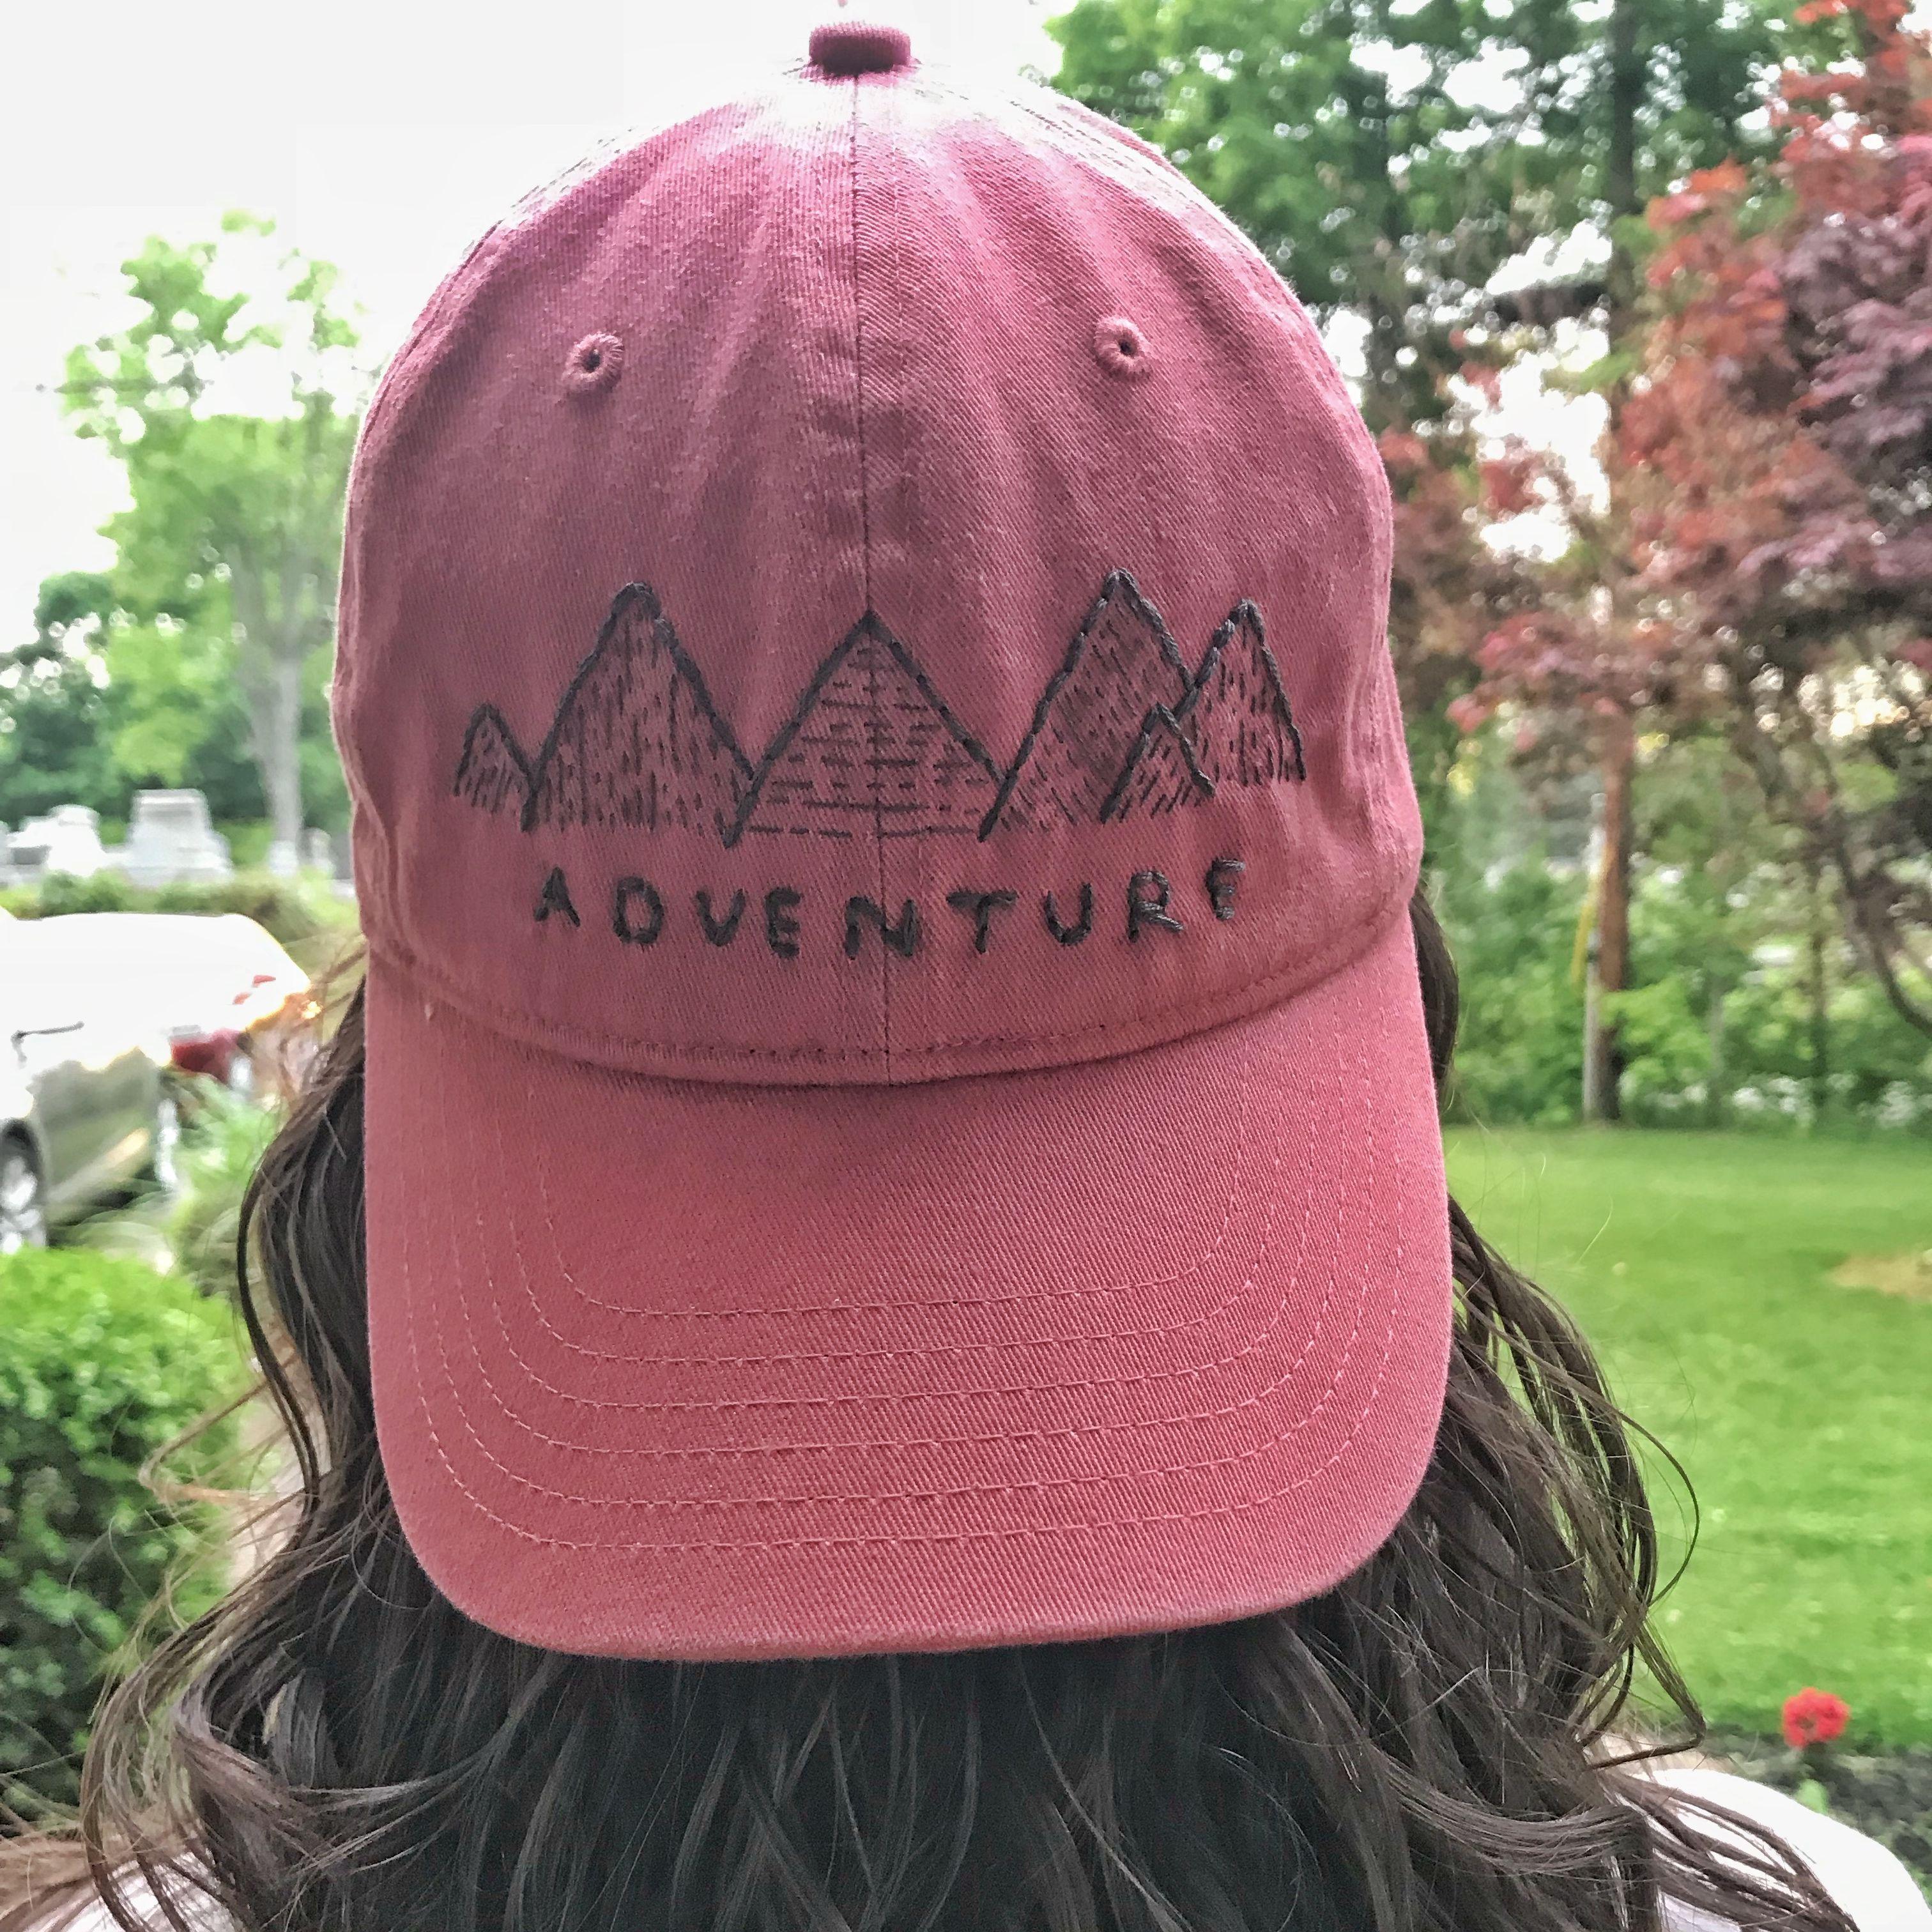 Outdoors Baseball Cap Women S Adventure Hat Hand Embroidery Adventure Hat Hat Embroidery Embroidered Hats